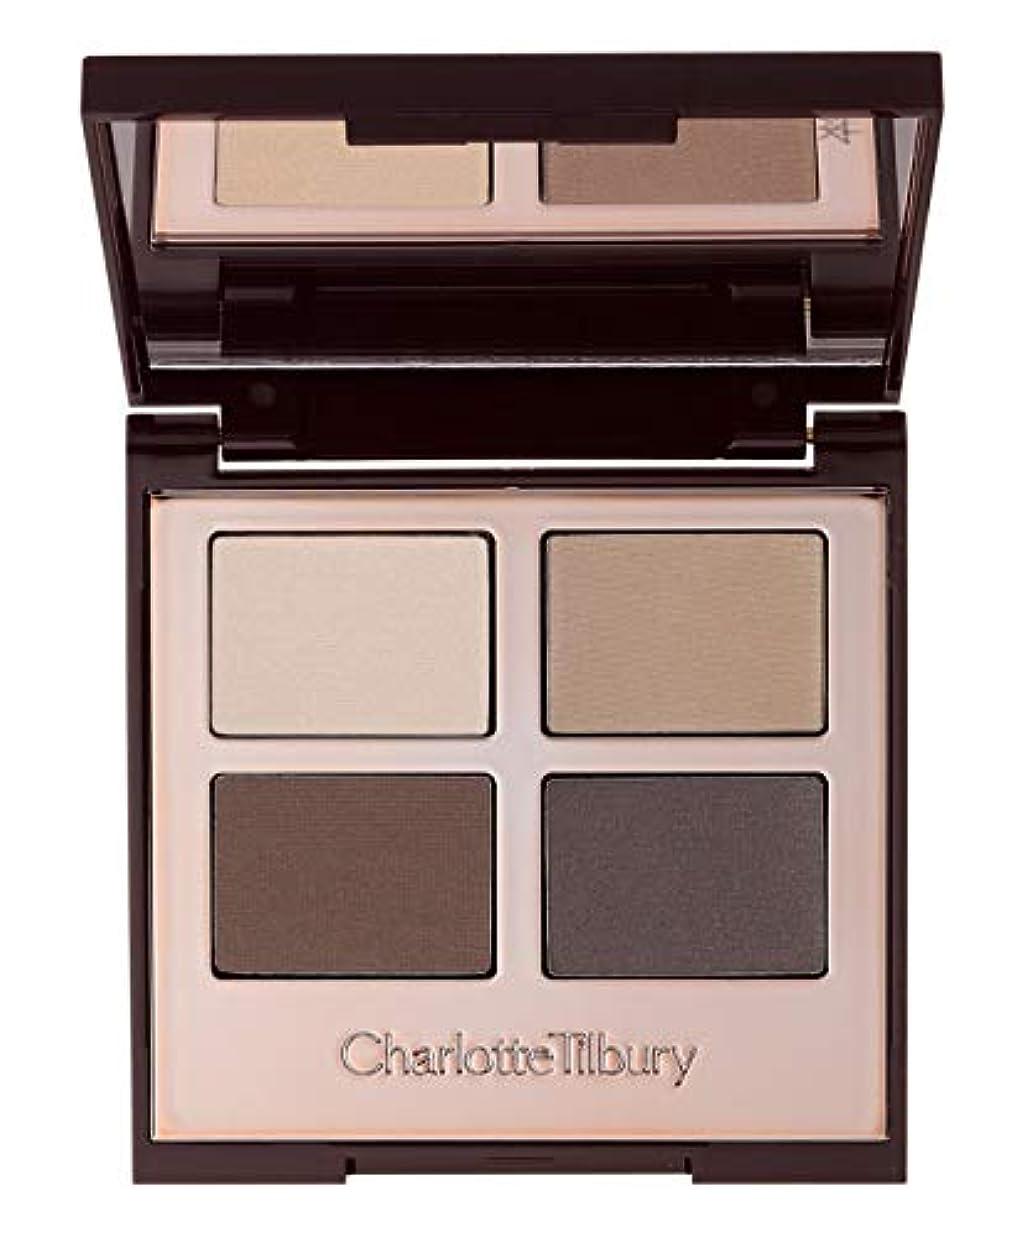 CHARLOTTE TILBURY Luxury Palette - The Sophisticate 5.2g